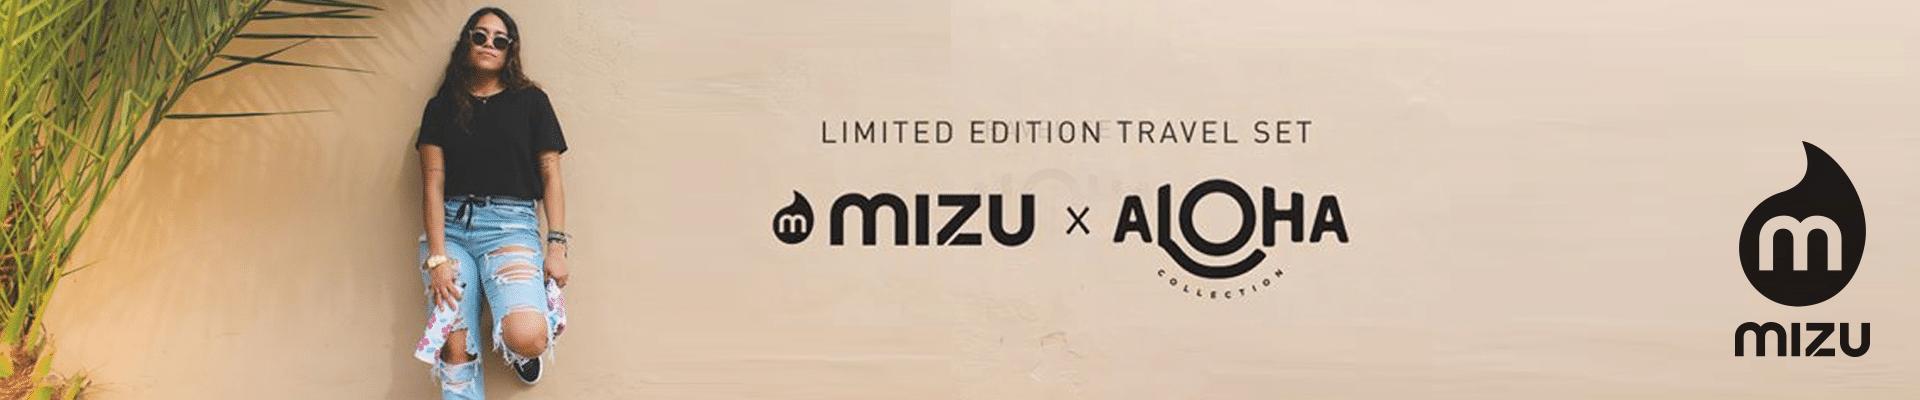 Banner Mizu FKSS 2020 - Home